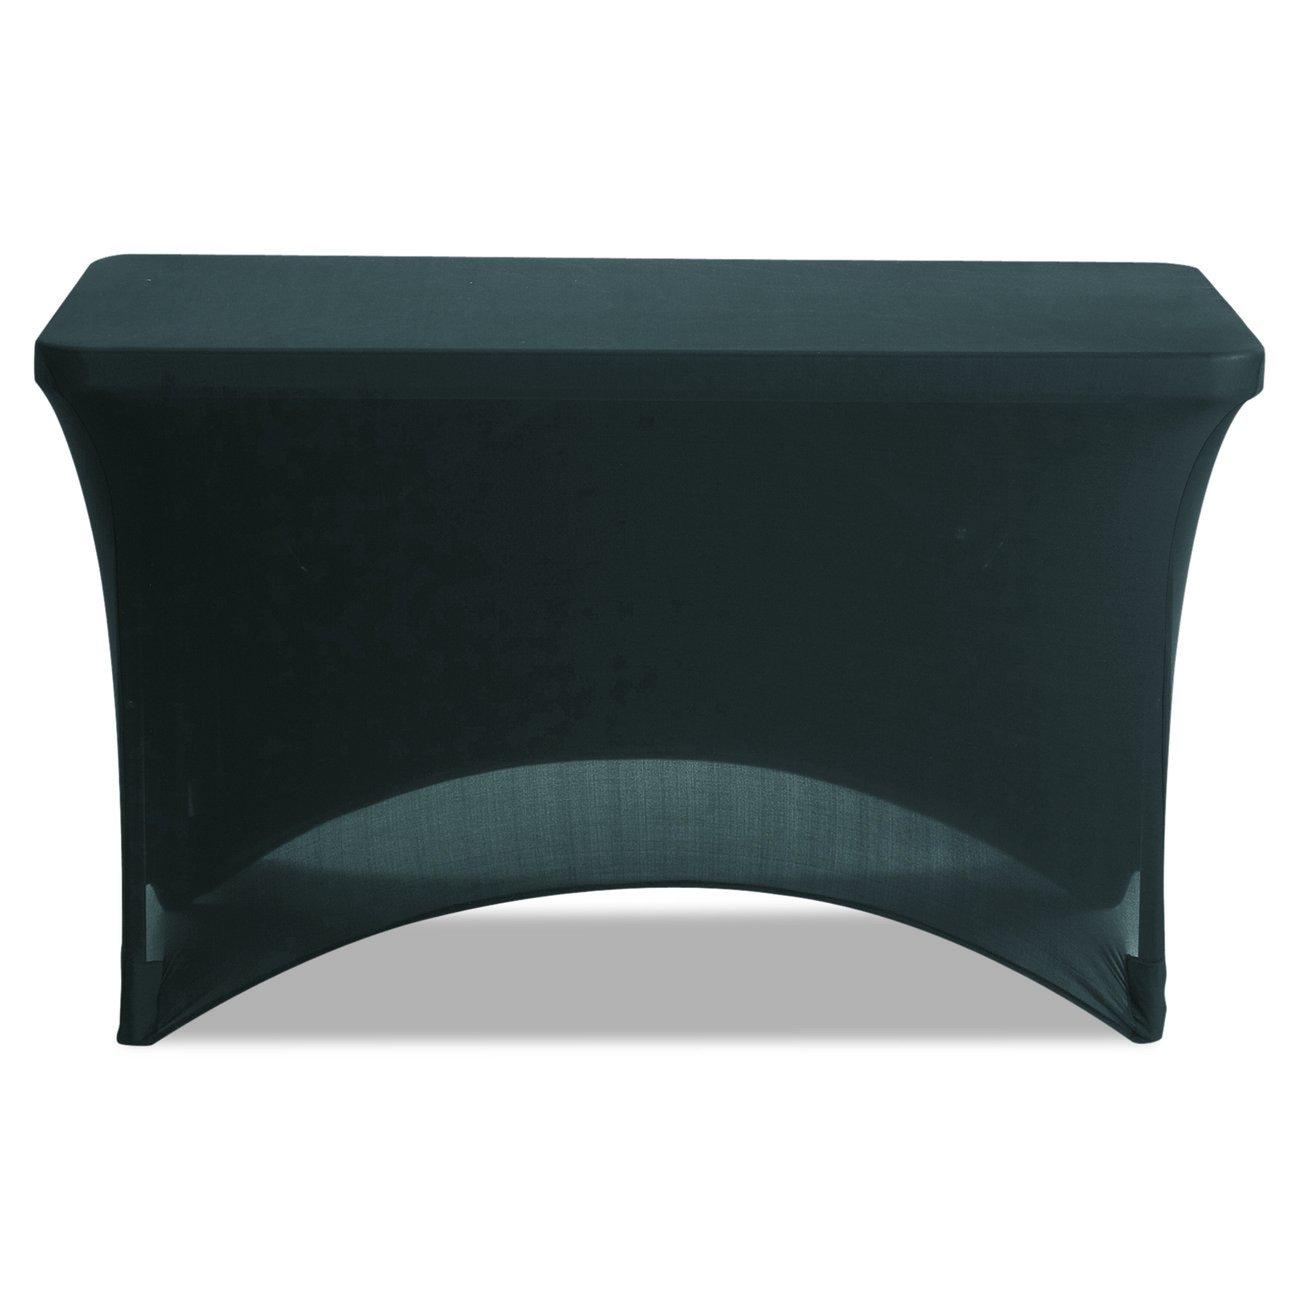 Iceberg Spandex Fabric Table Cover, 4', Black